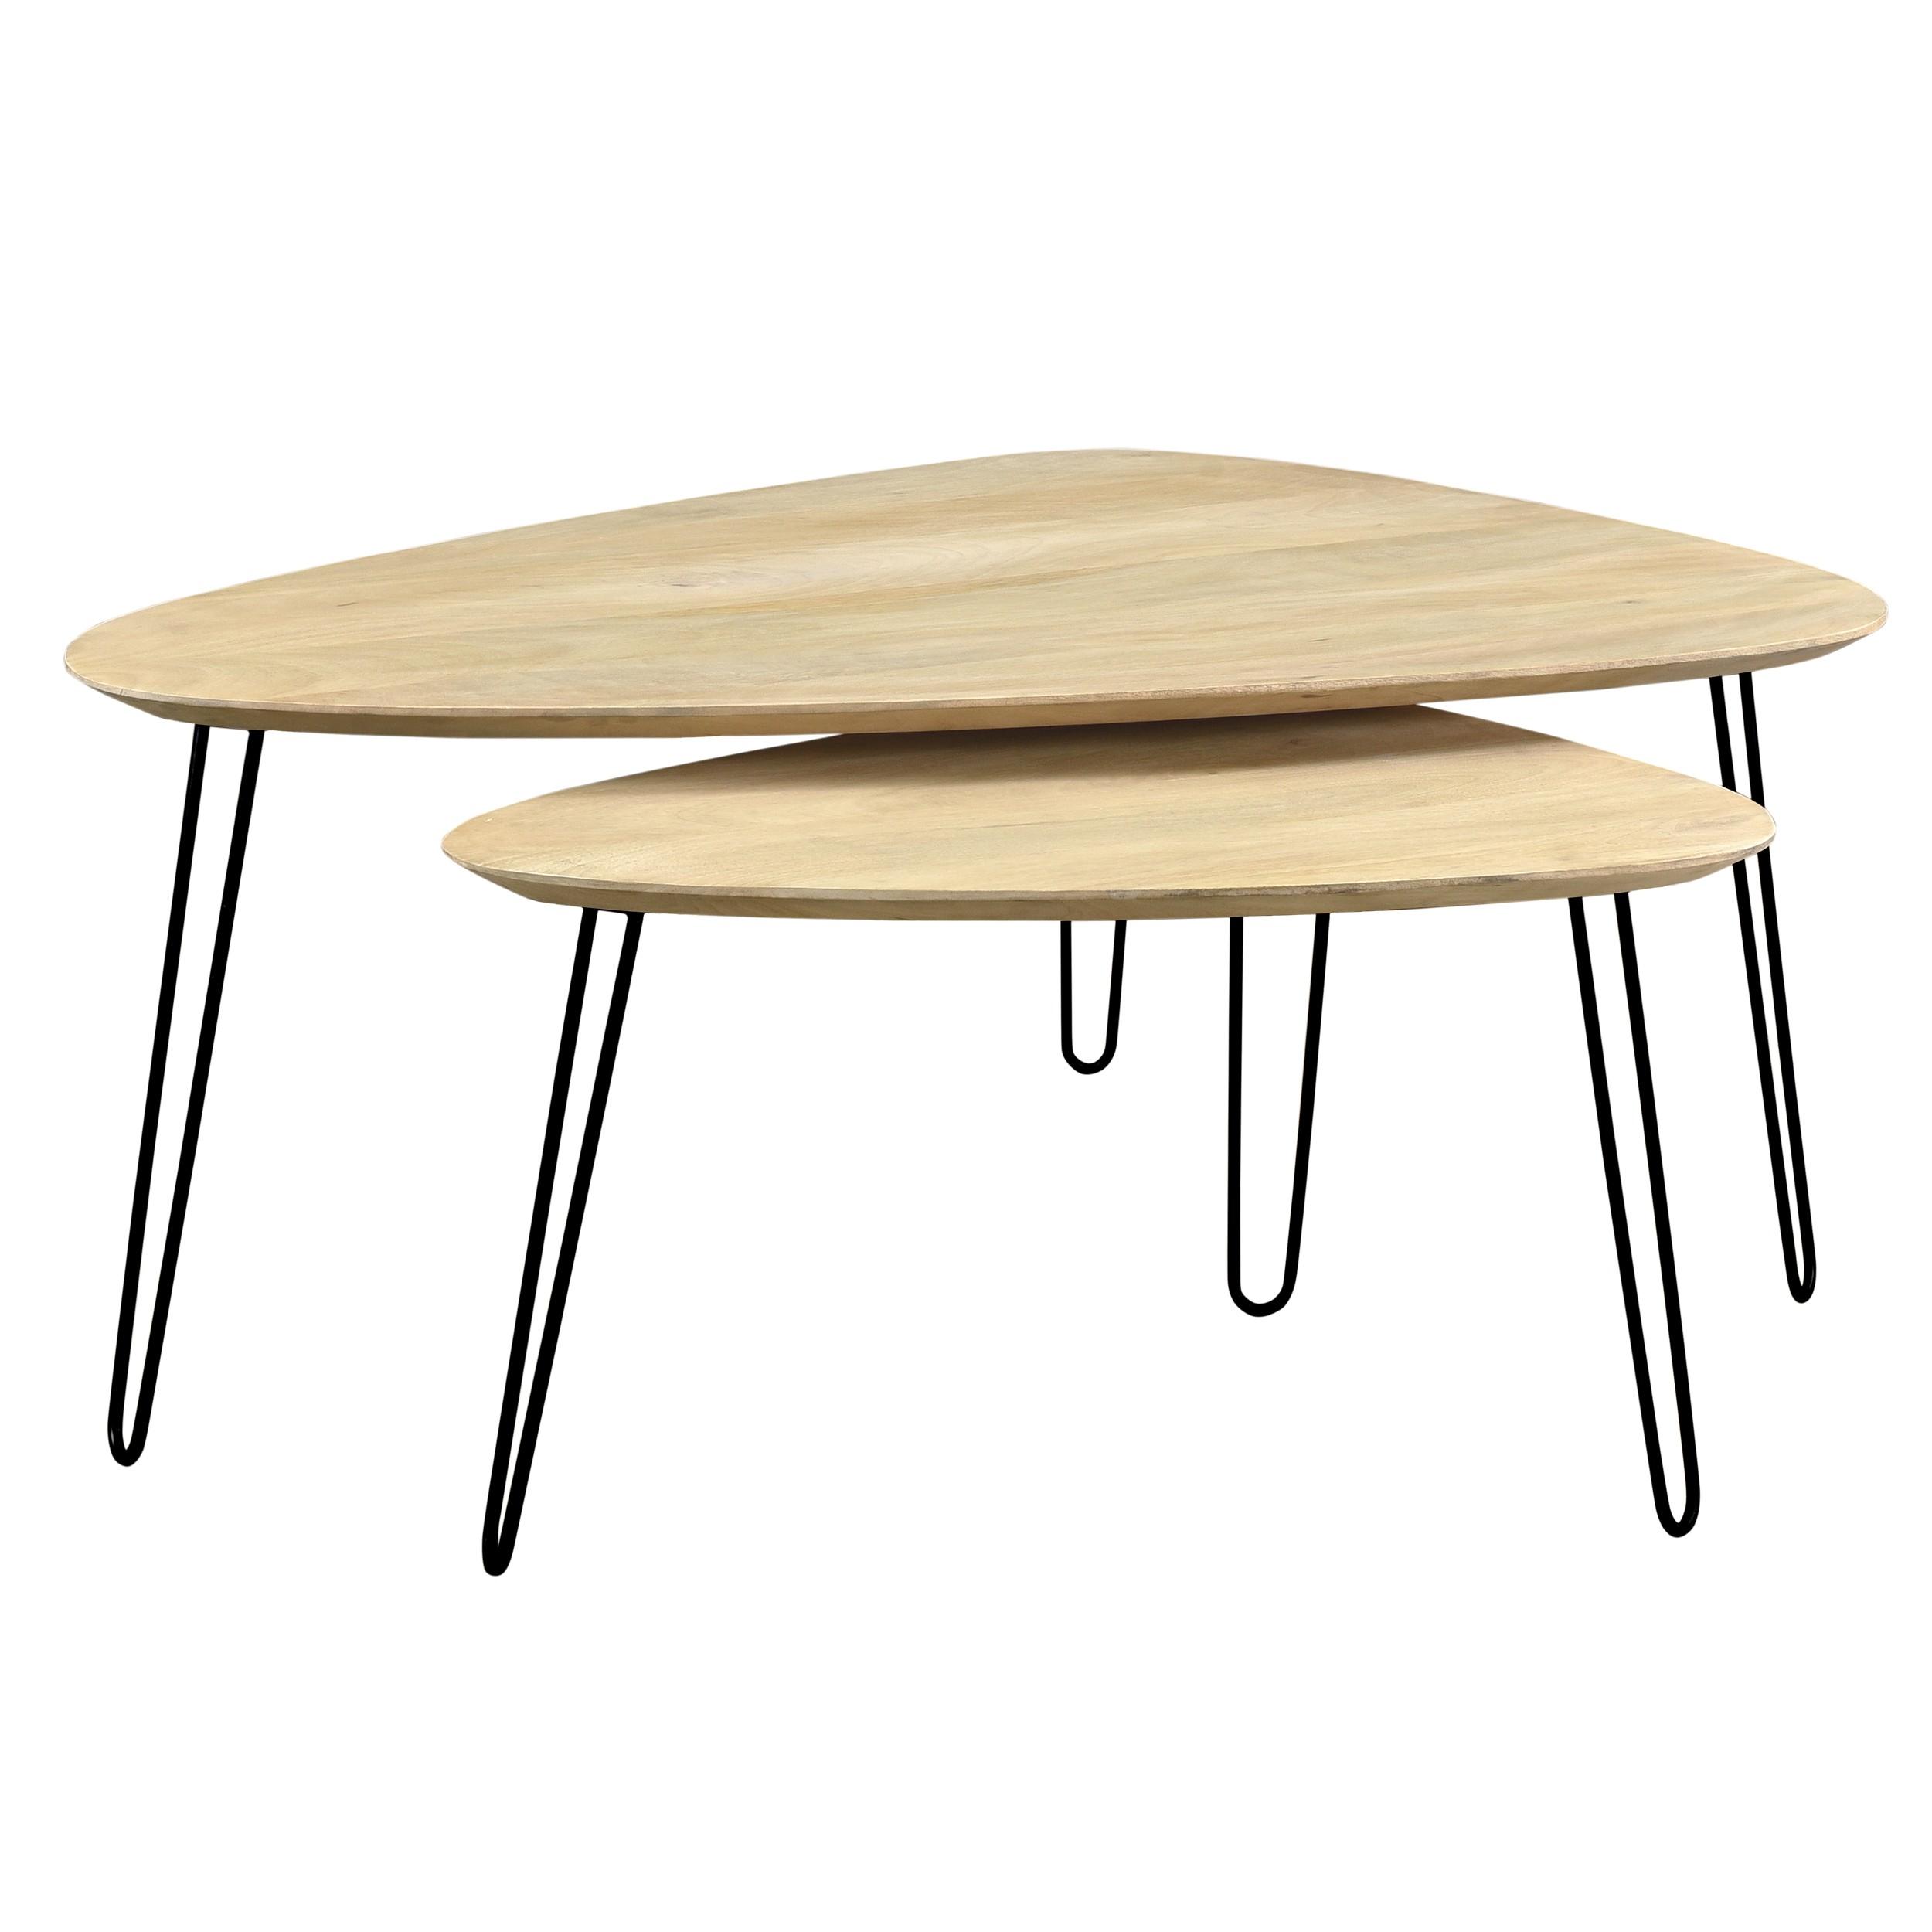 Table Basse Scandinave Gigogne.Tables Basses Gigognes Scandinaves Riga Lot De 2